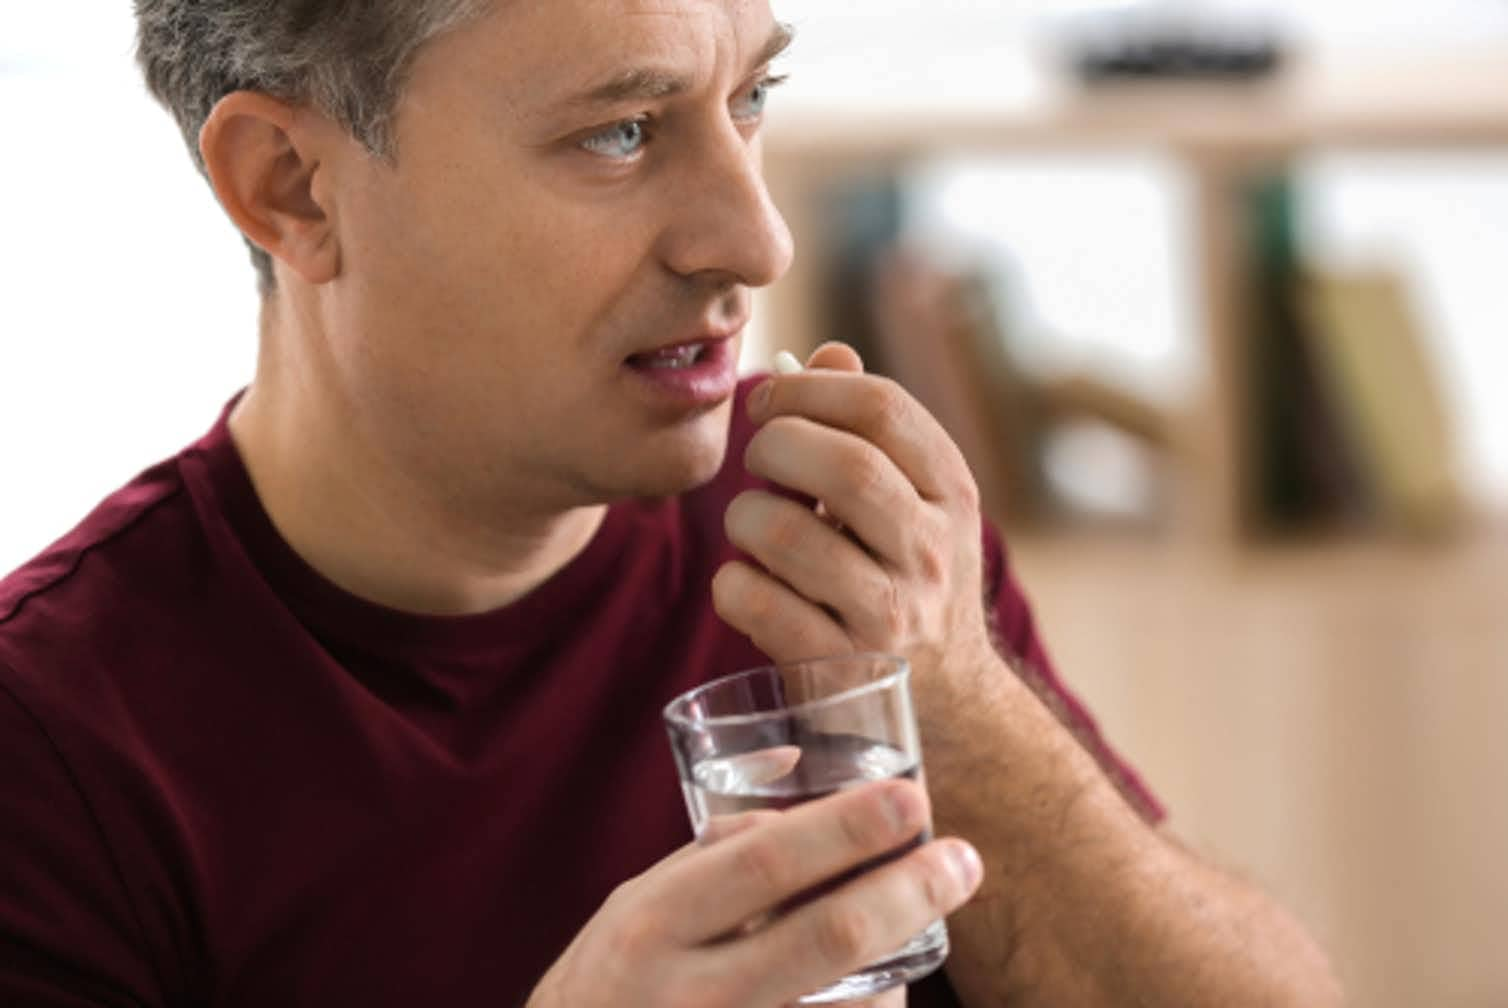 Photo of person taking antibiotics